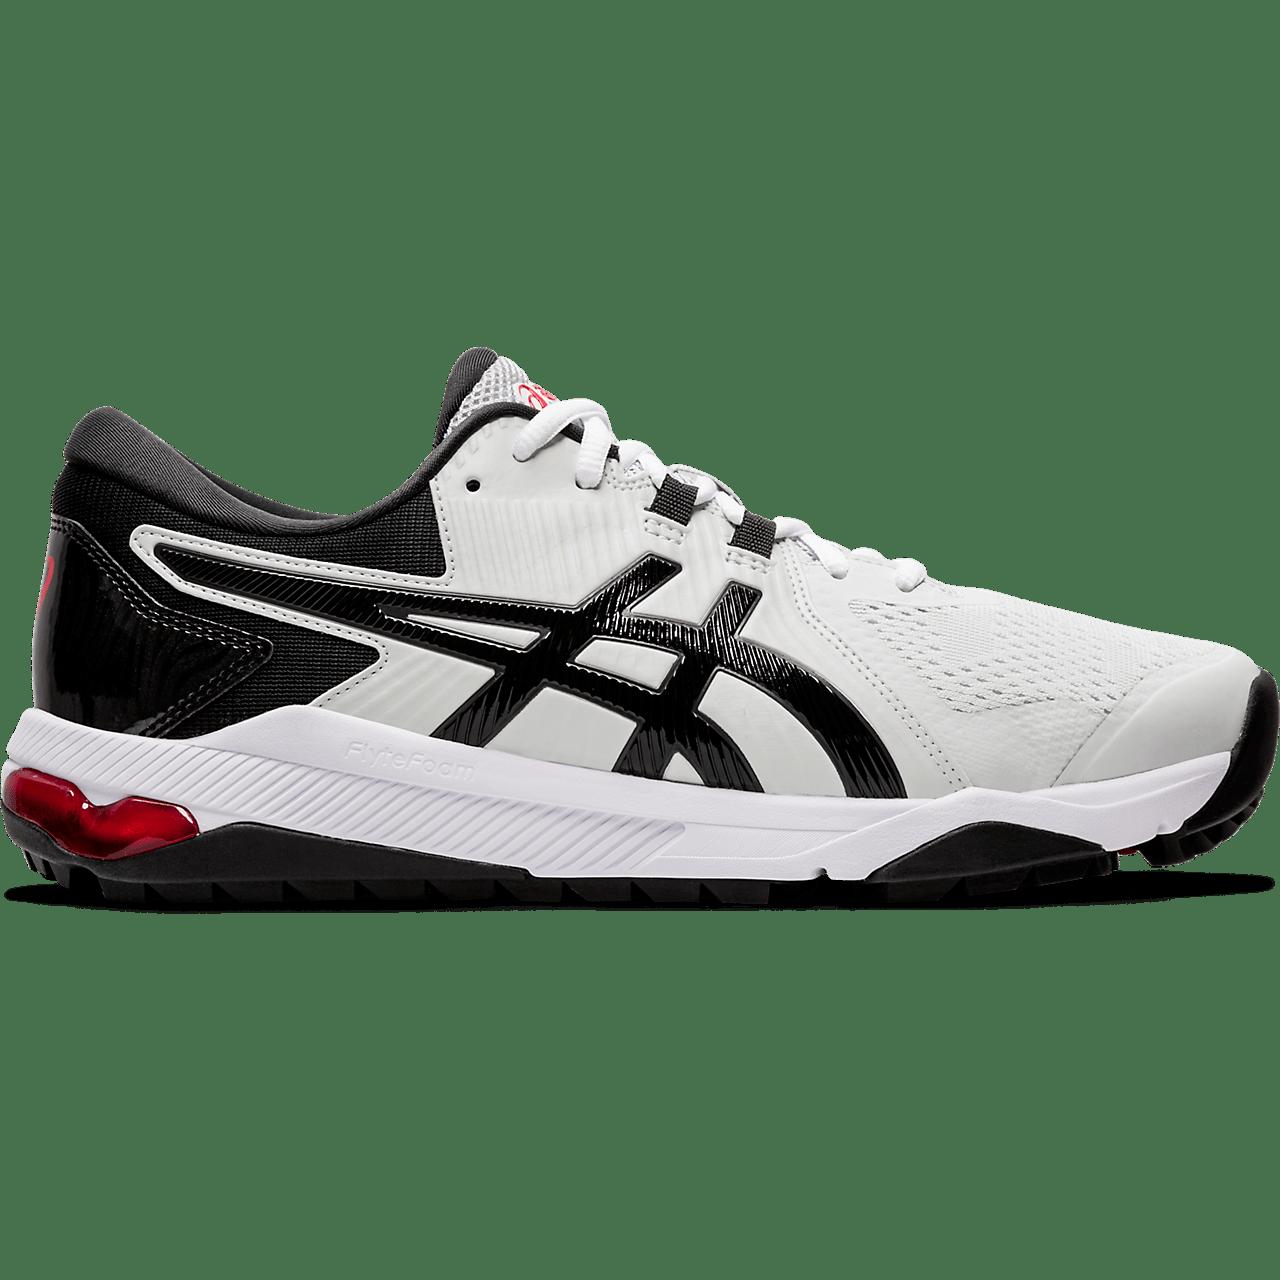 asics GEL-COURSE GLIDE Men's Golf Shoe